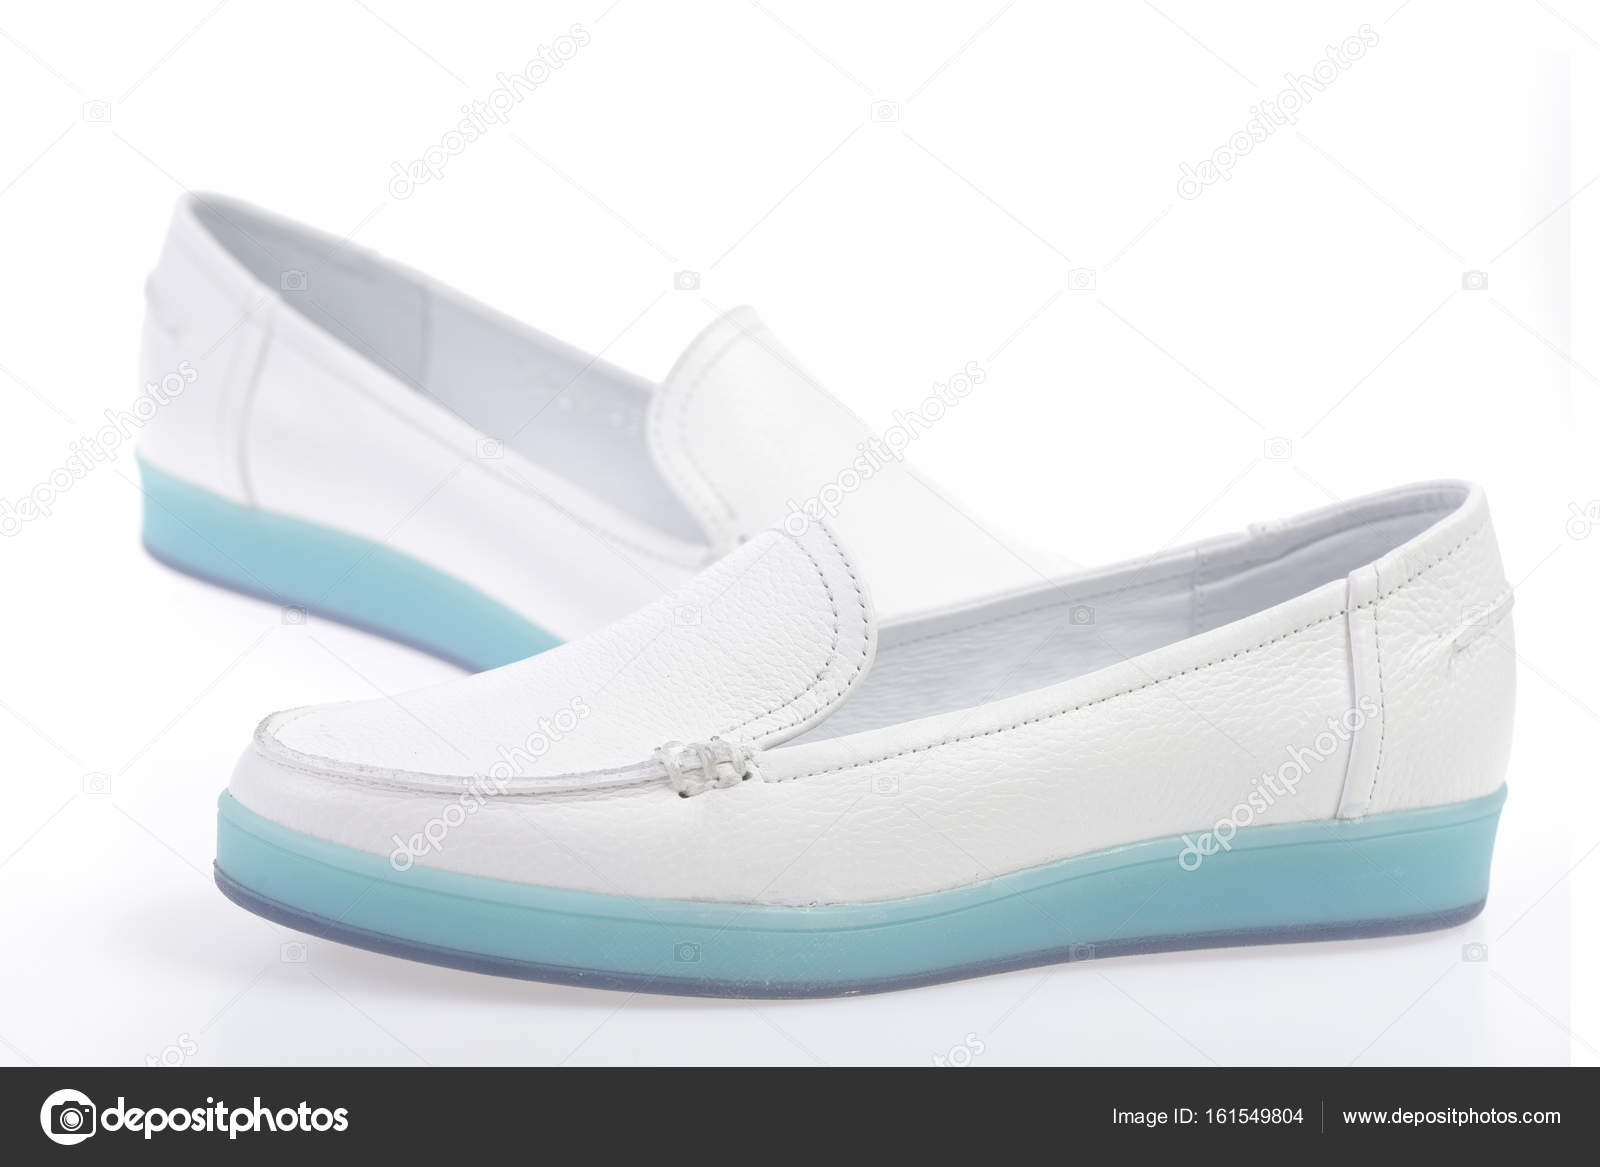 7a132278094 Ζευγάρι γυναικεία δερμάτινα παπούτσια που απομονώνονται σε λευκό ...